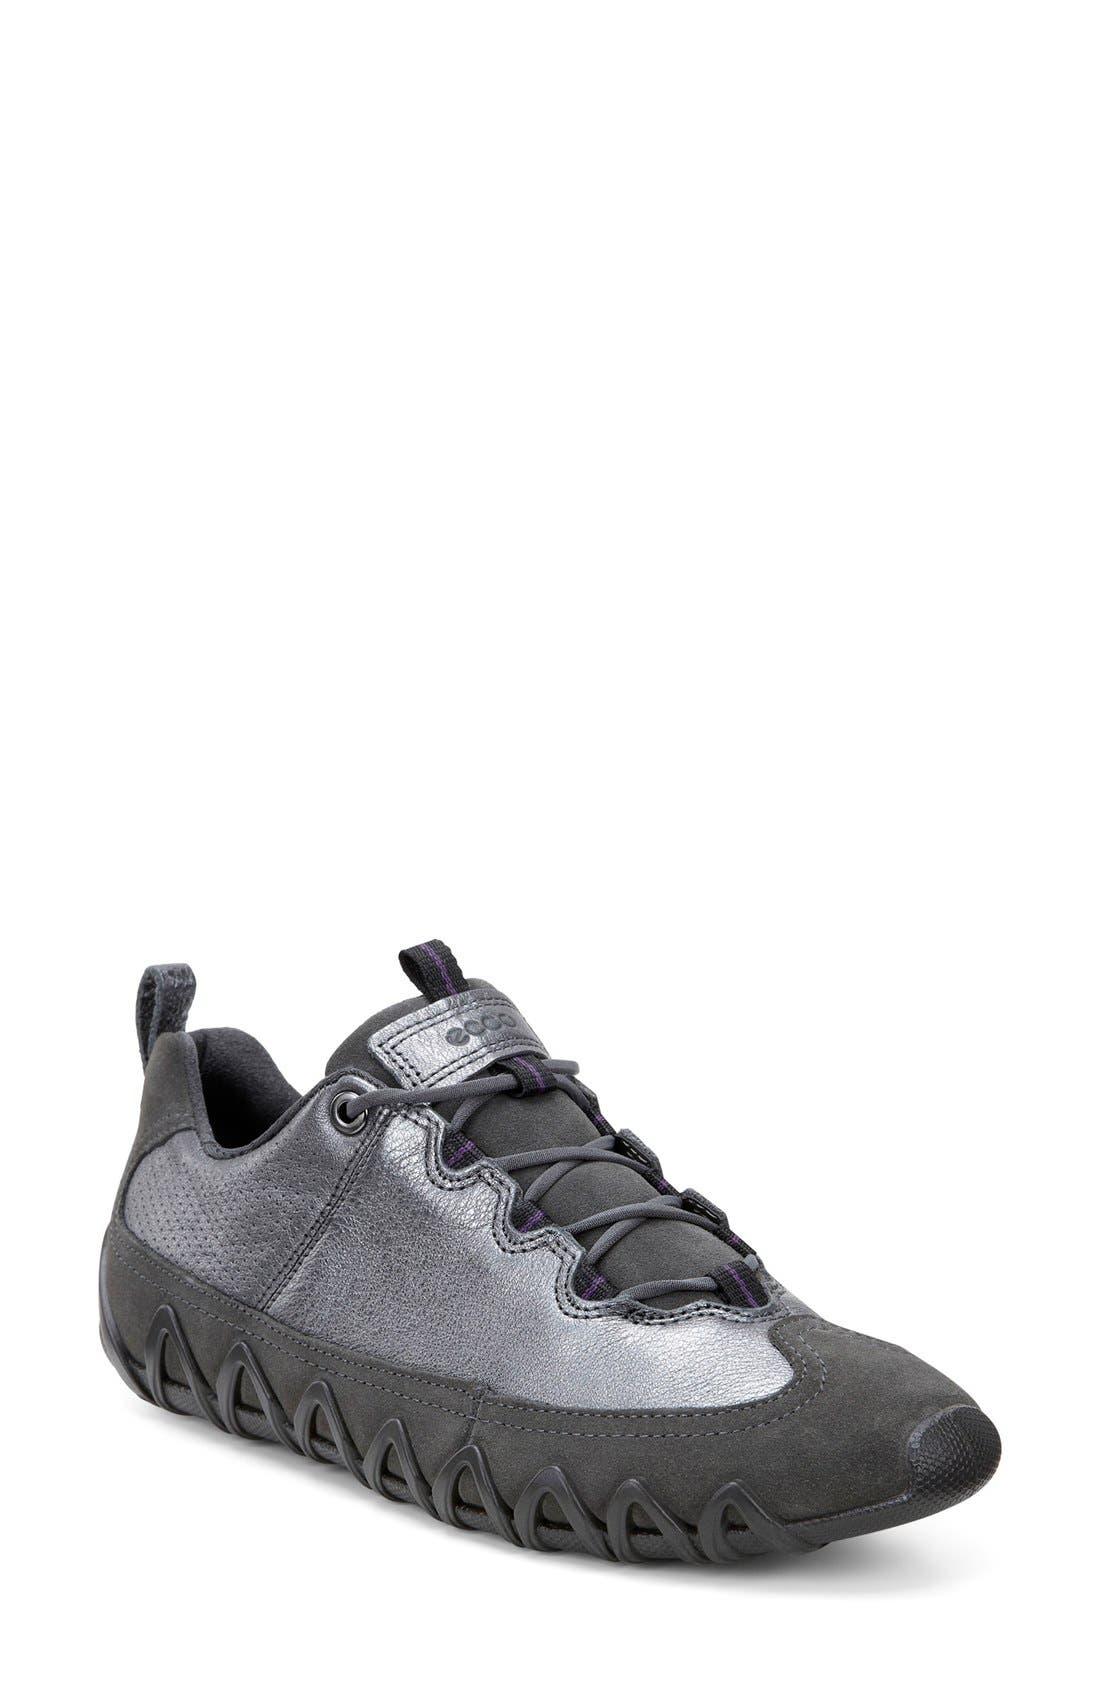 'Dayla' Toggle Sneaker,                             Main thumbnail 1, color,                             040